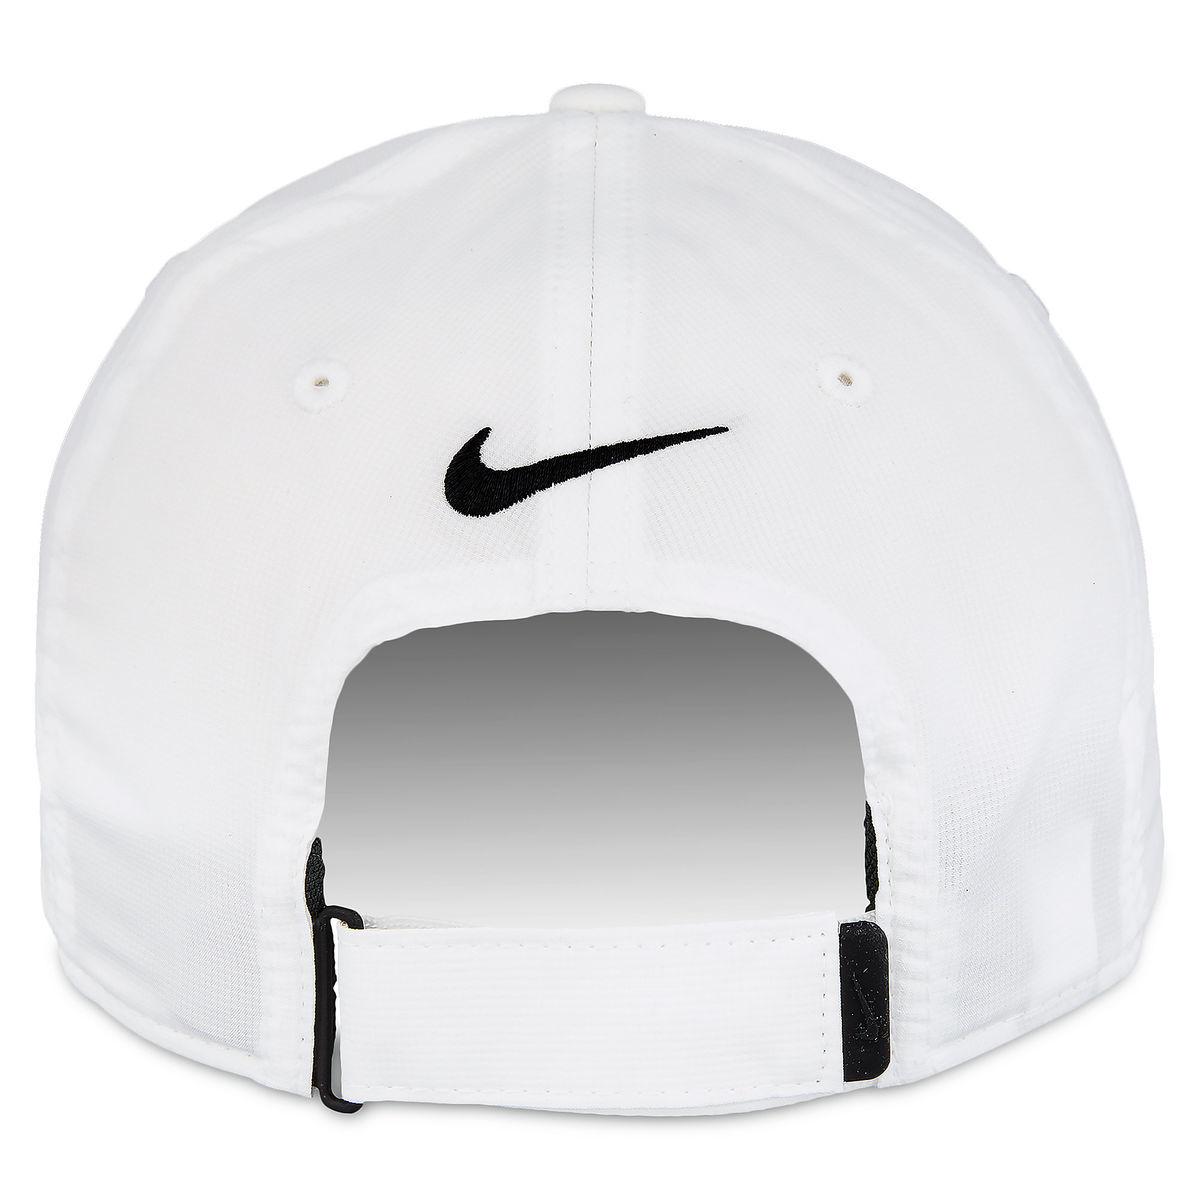 9da905a999e Mickey Mouse Silhouette Baseball Hat by Nike - White